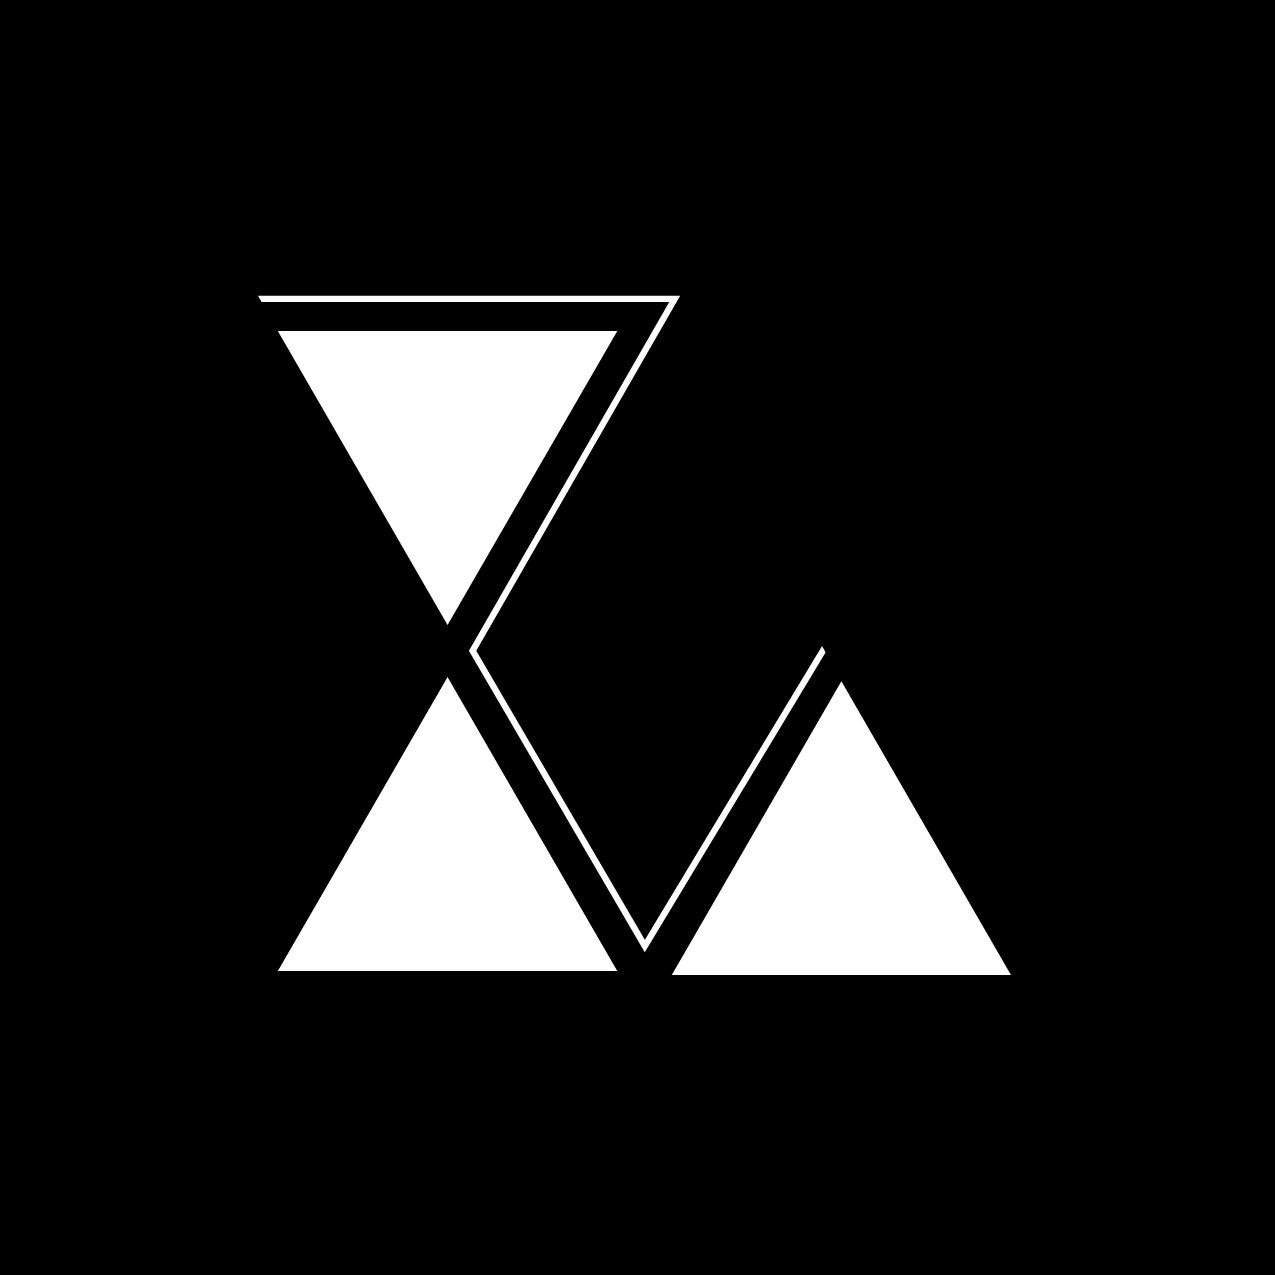 Letter L5 Design by Furia